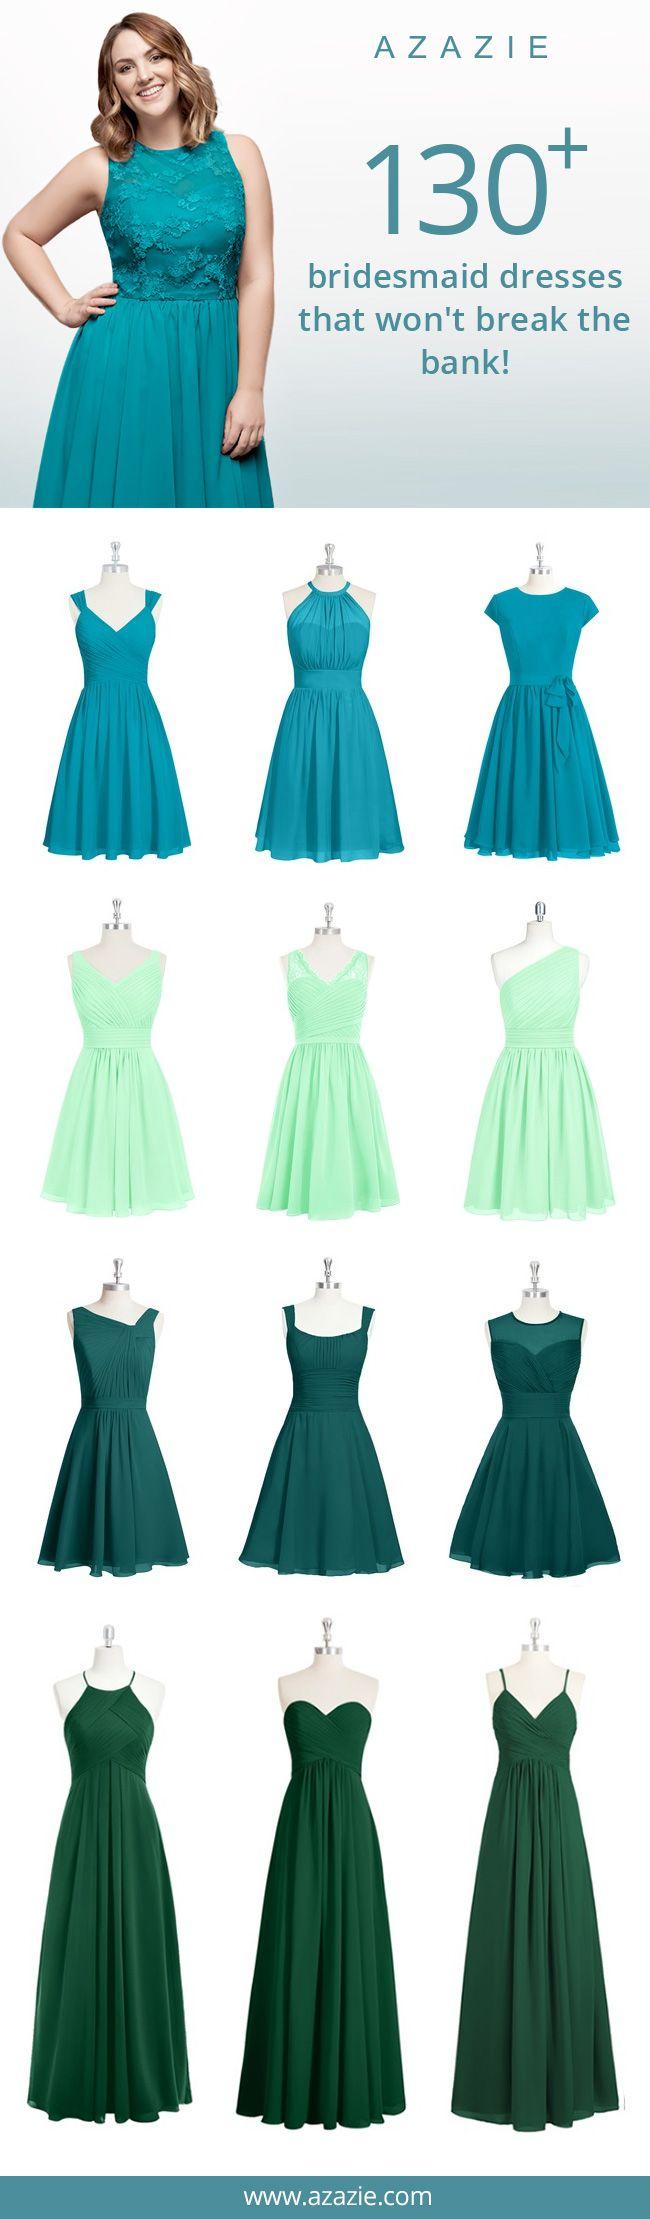 785 best Wedding Dresses images on Pinterest   Gown wedding, Groom ...